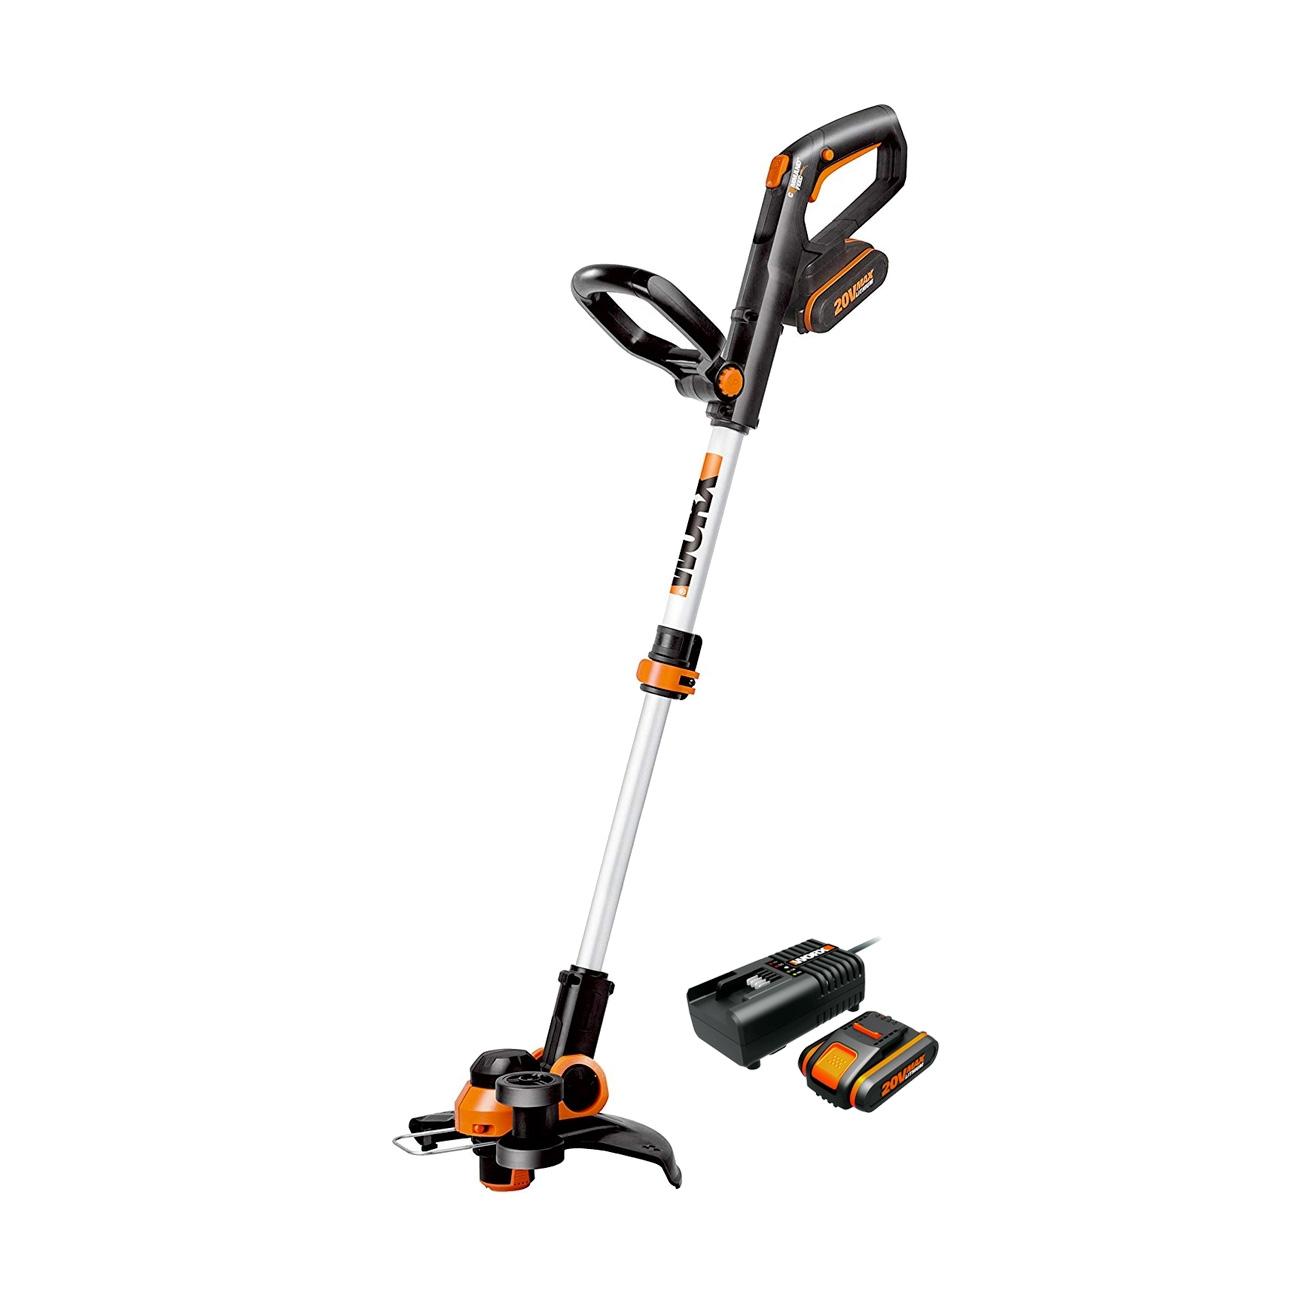 Worx WG163E.1 Cordless grass trimmer